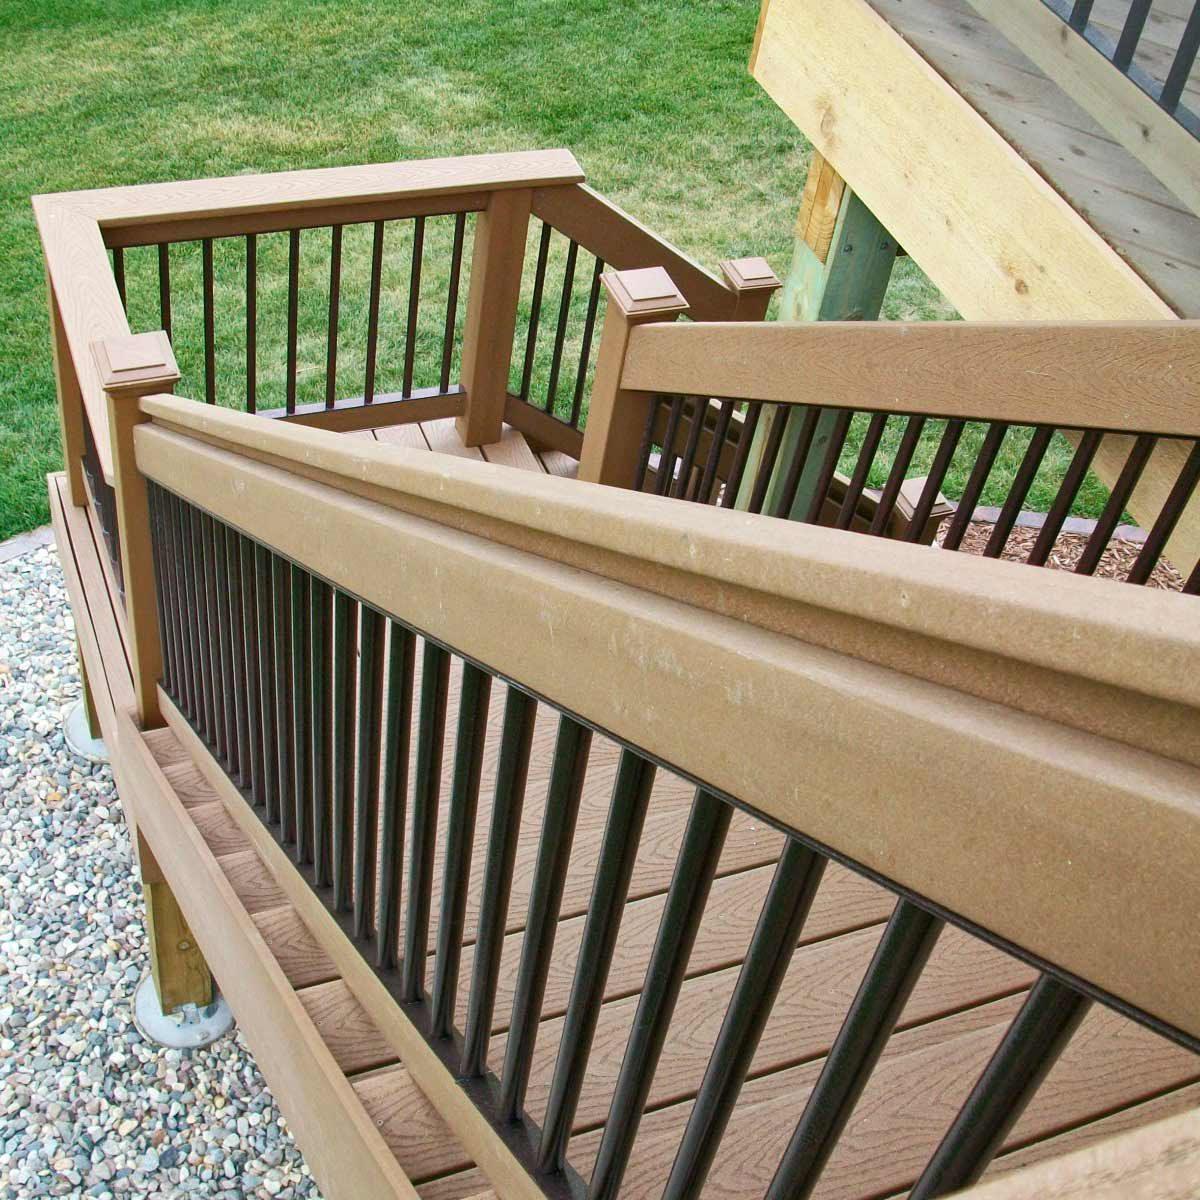 Deck/railing material options